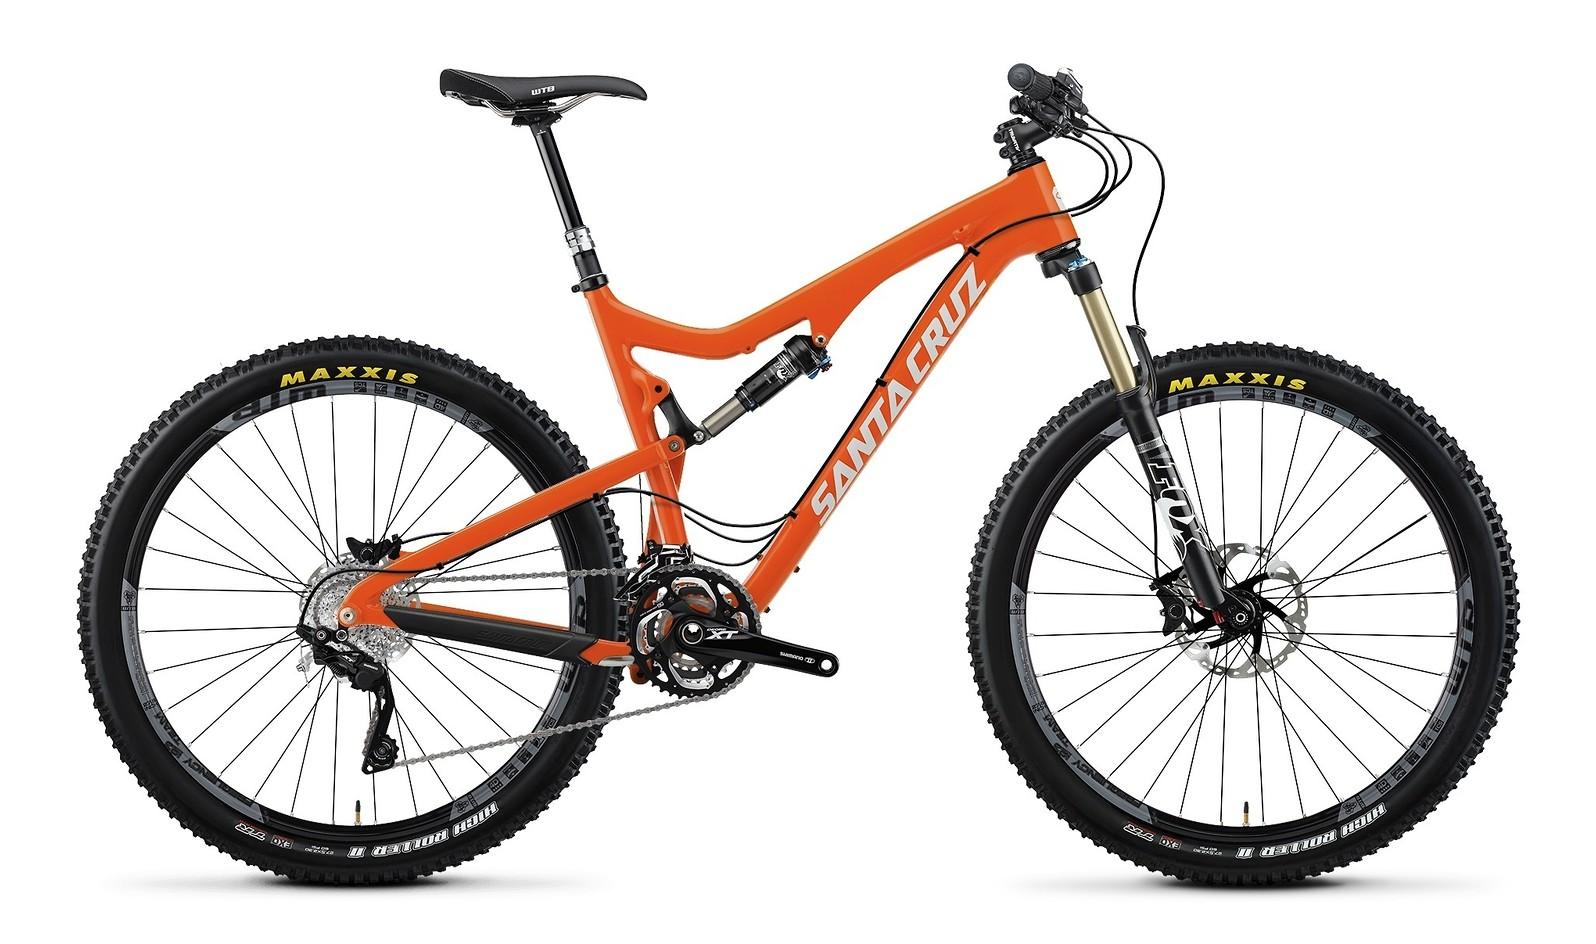 2014 Santa Cruz 5010 Carbon SPX AM 27.5 Bike 2014 Santa Cruz Solo Carbon SPX AM 27.5 Bike - orange